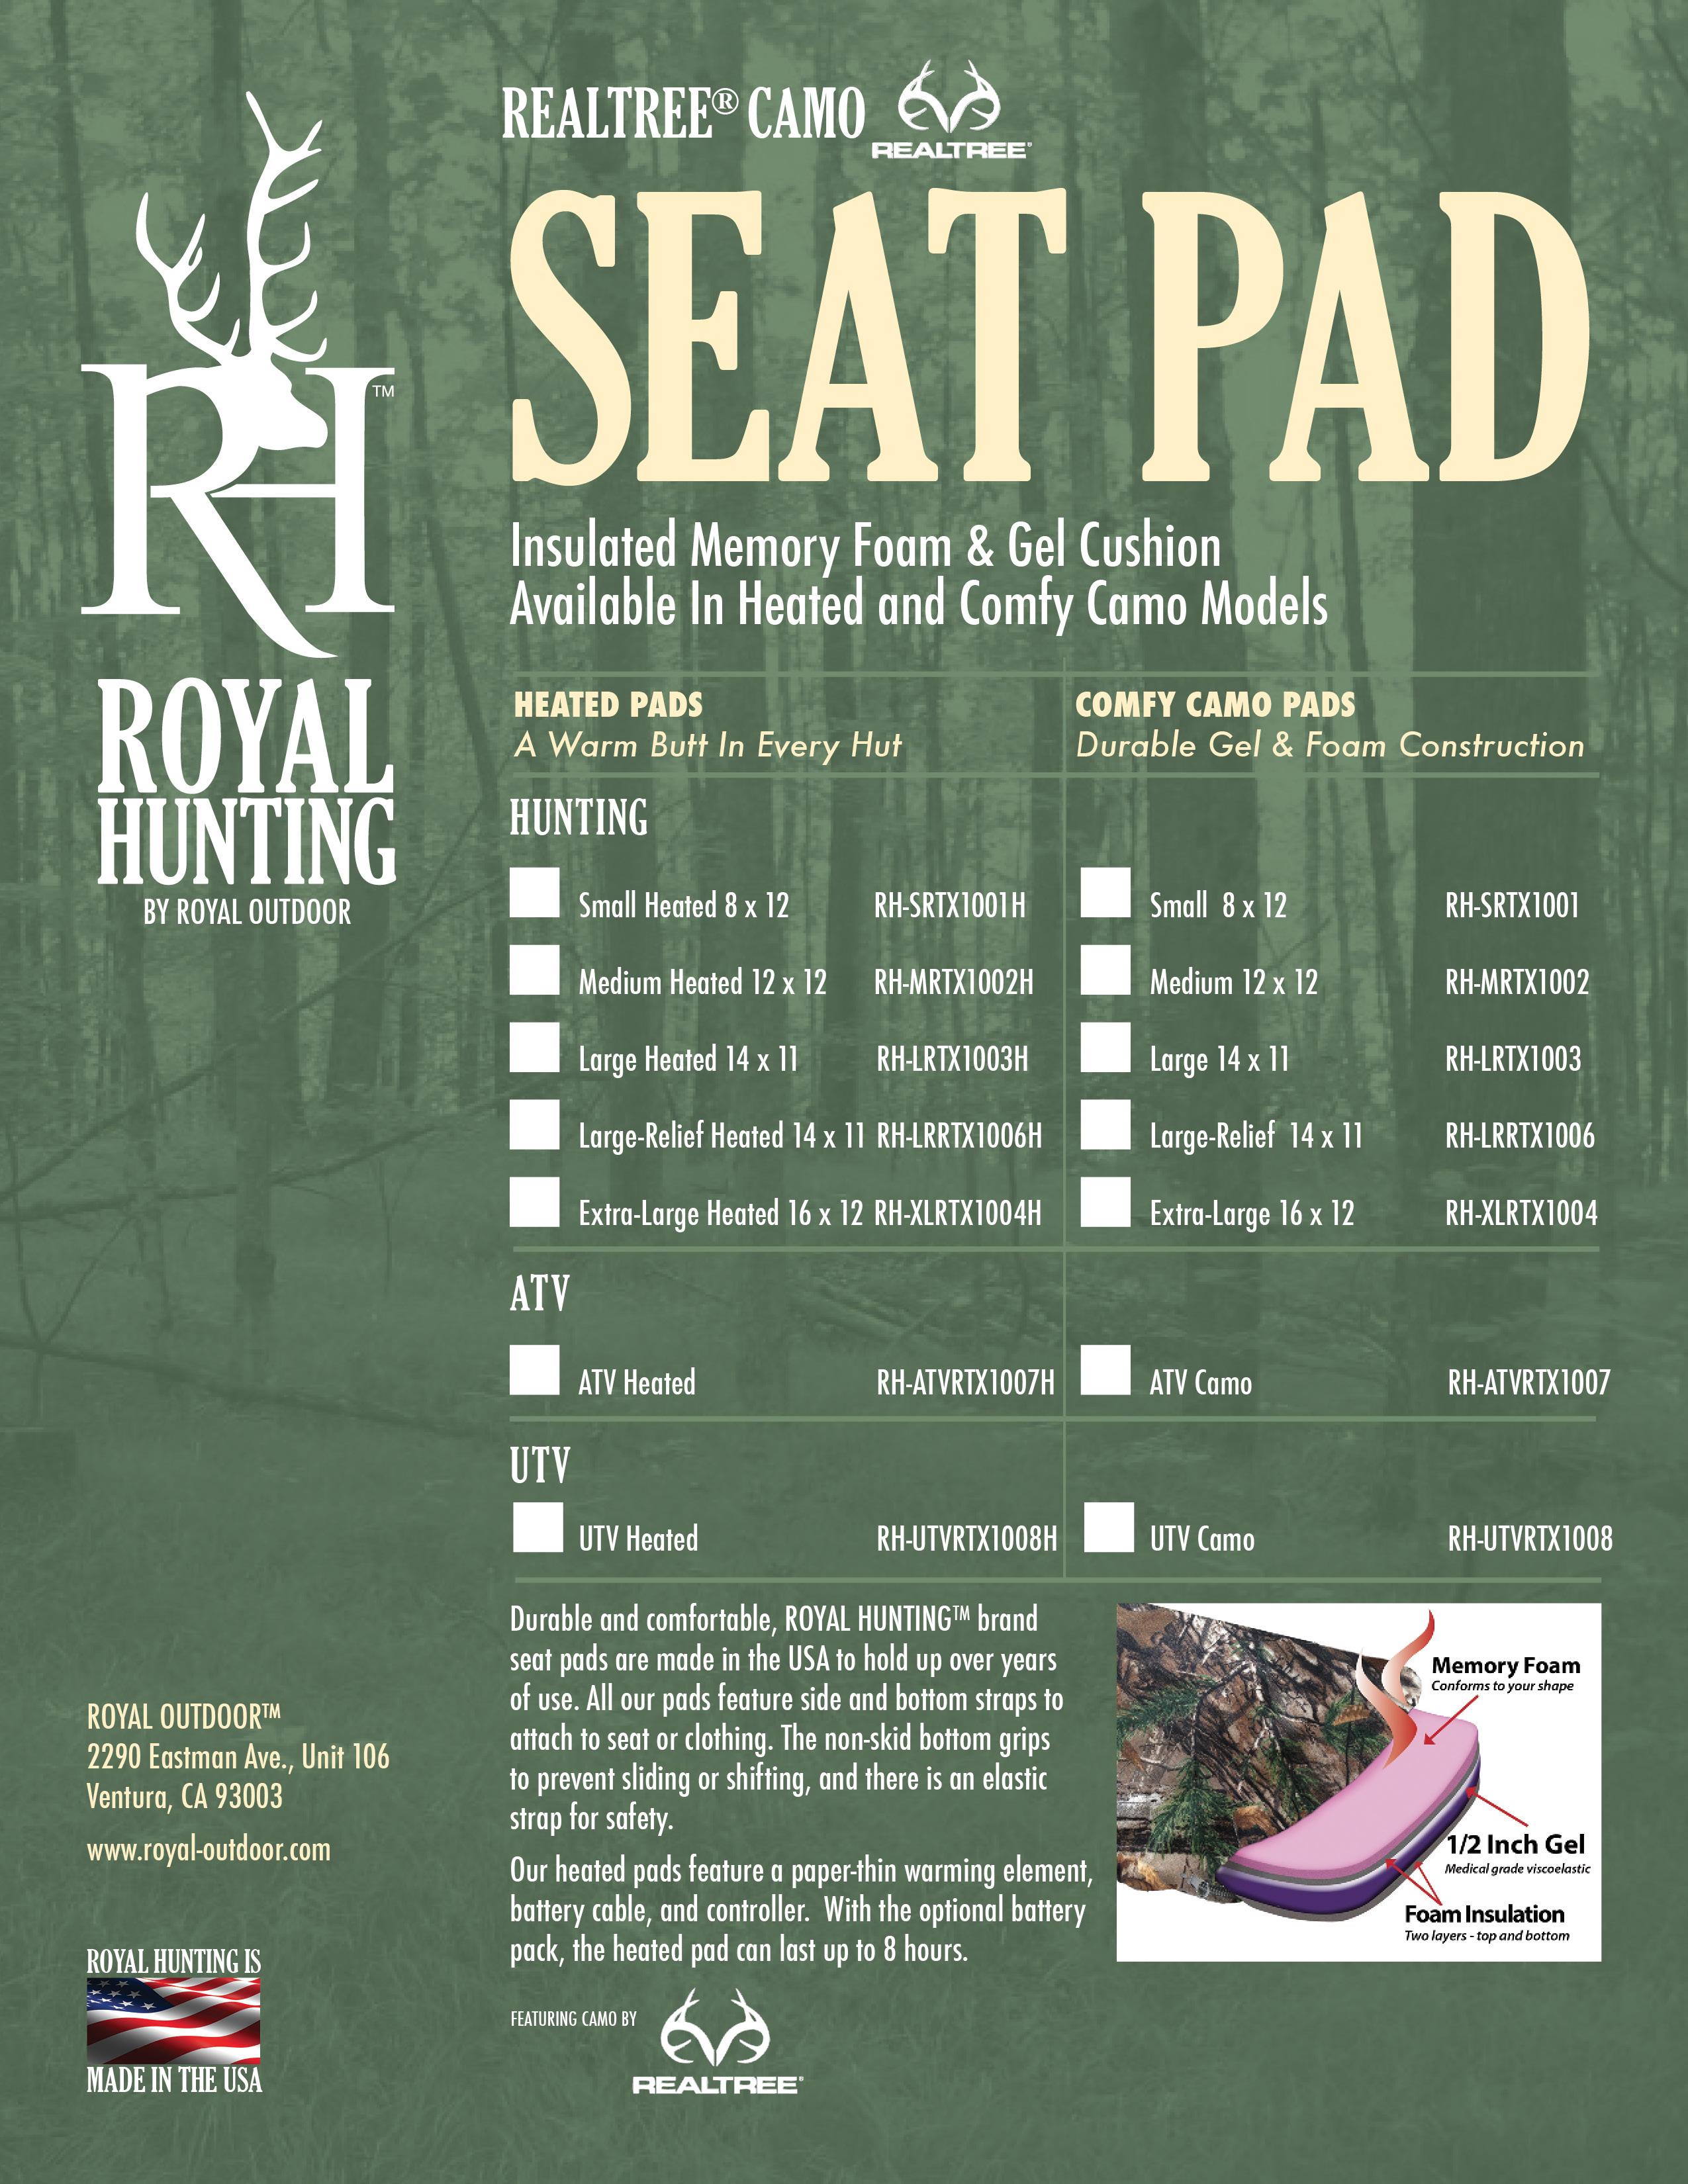 Royal Hunting Product Insert